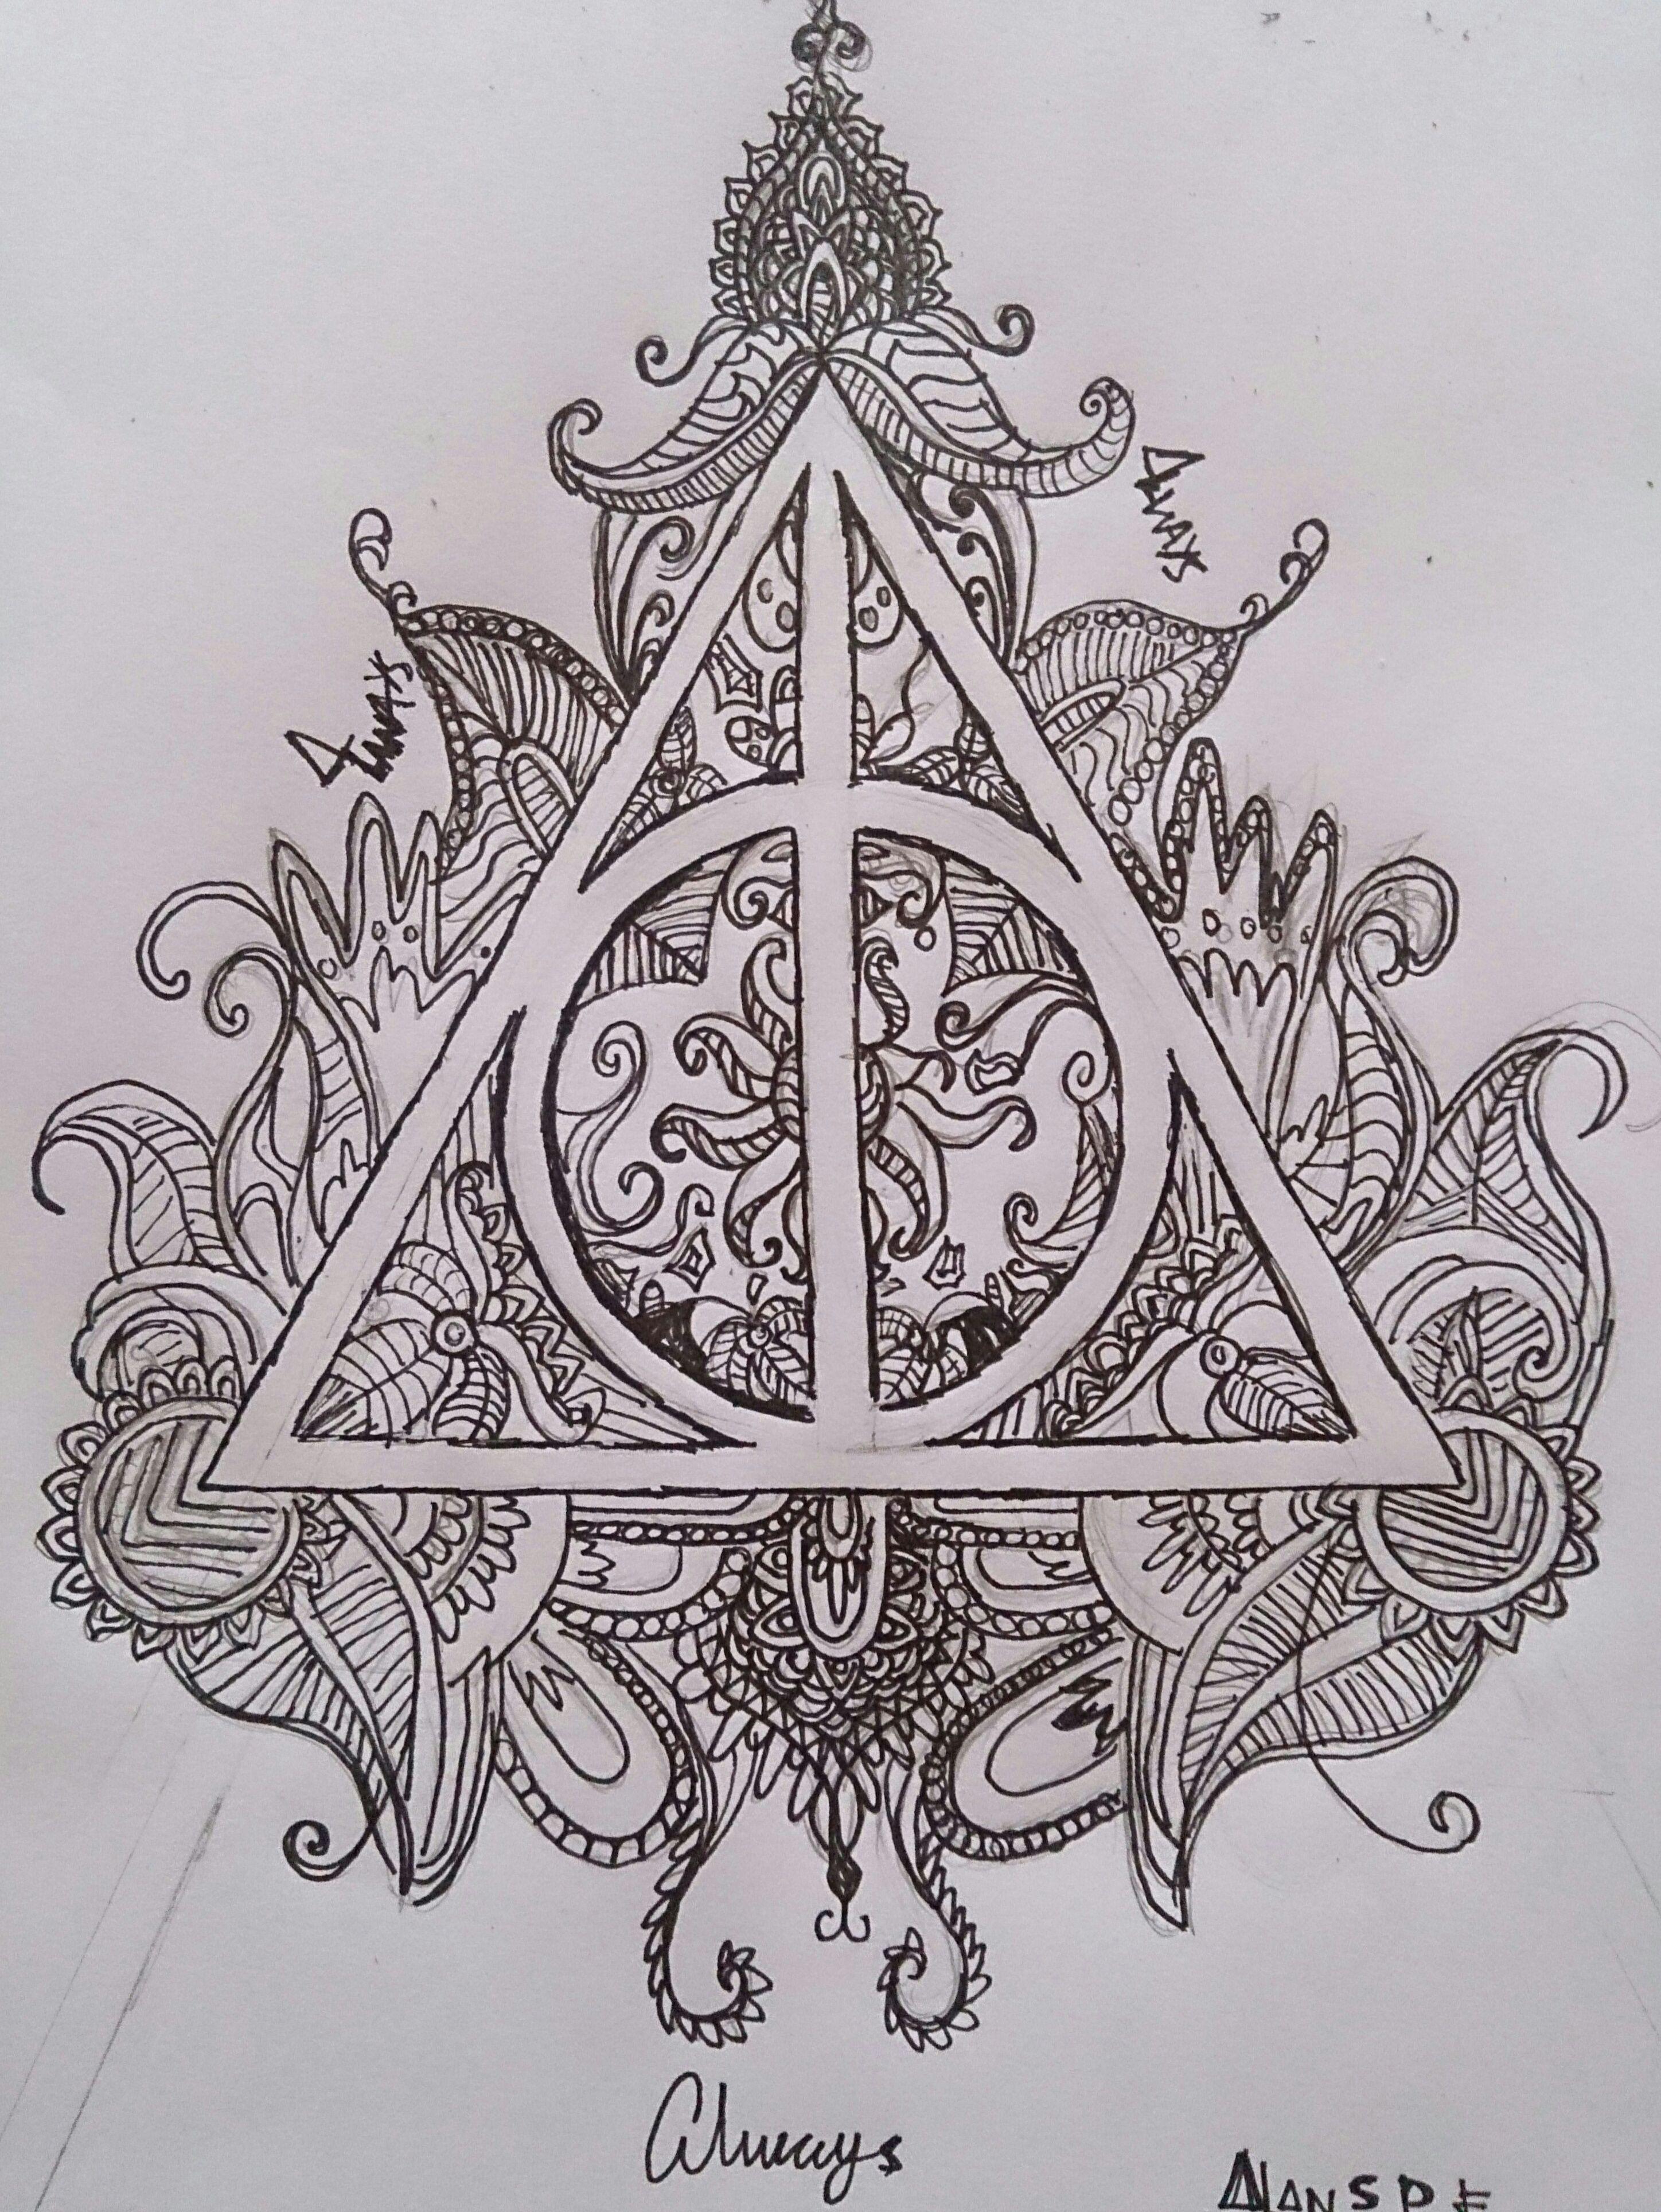 Harry Potter Deathly Hallows Zectangle Artwork Con Imagenes